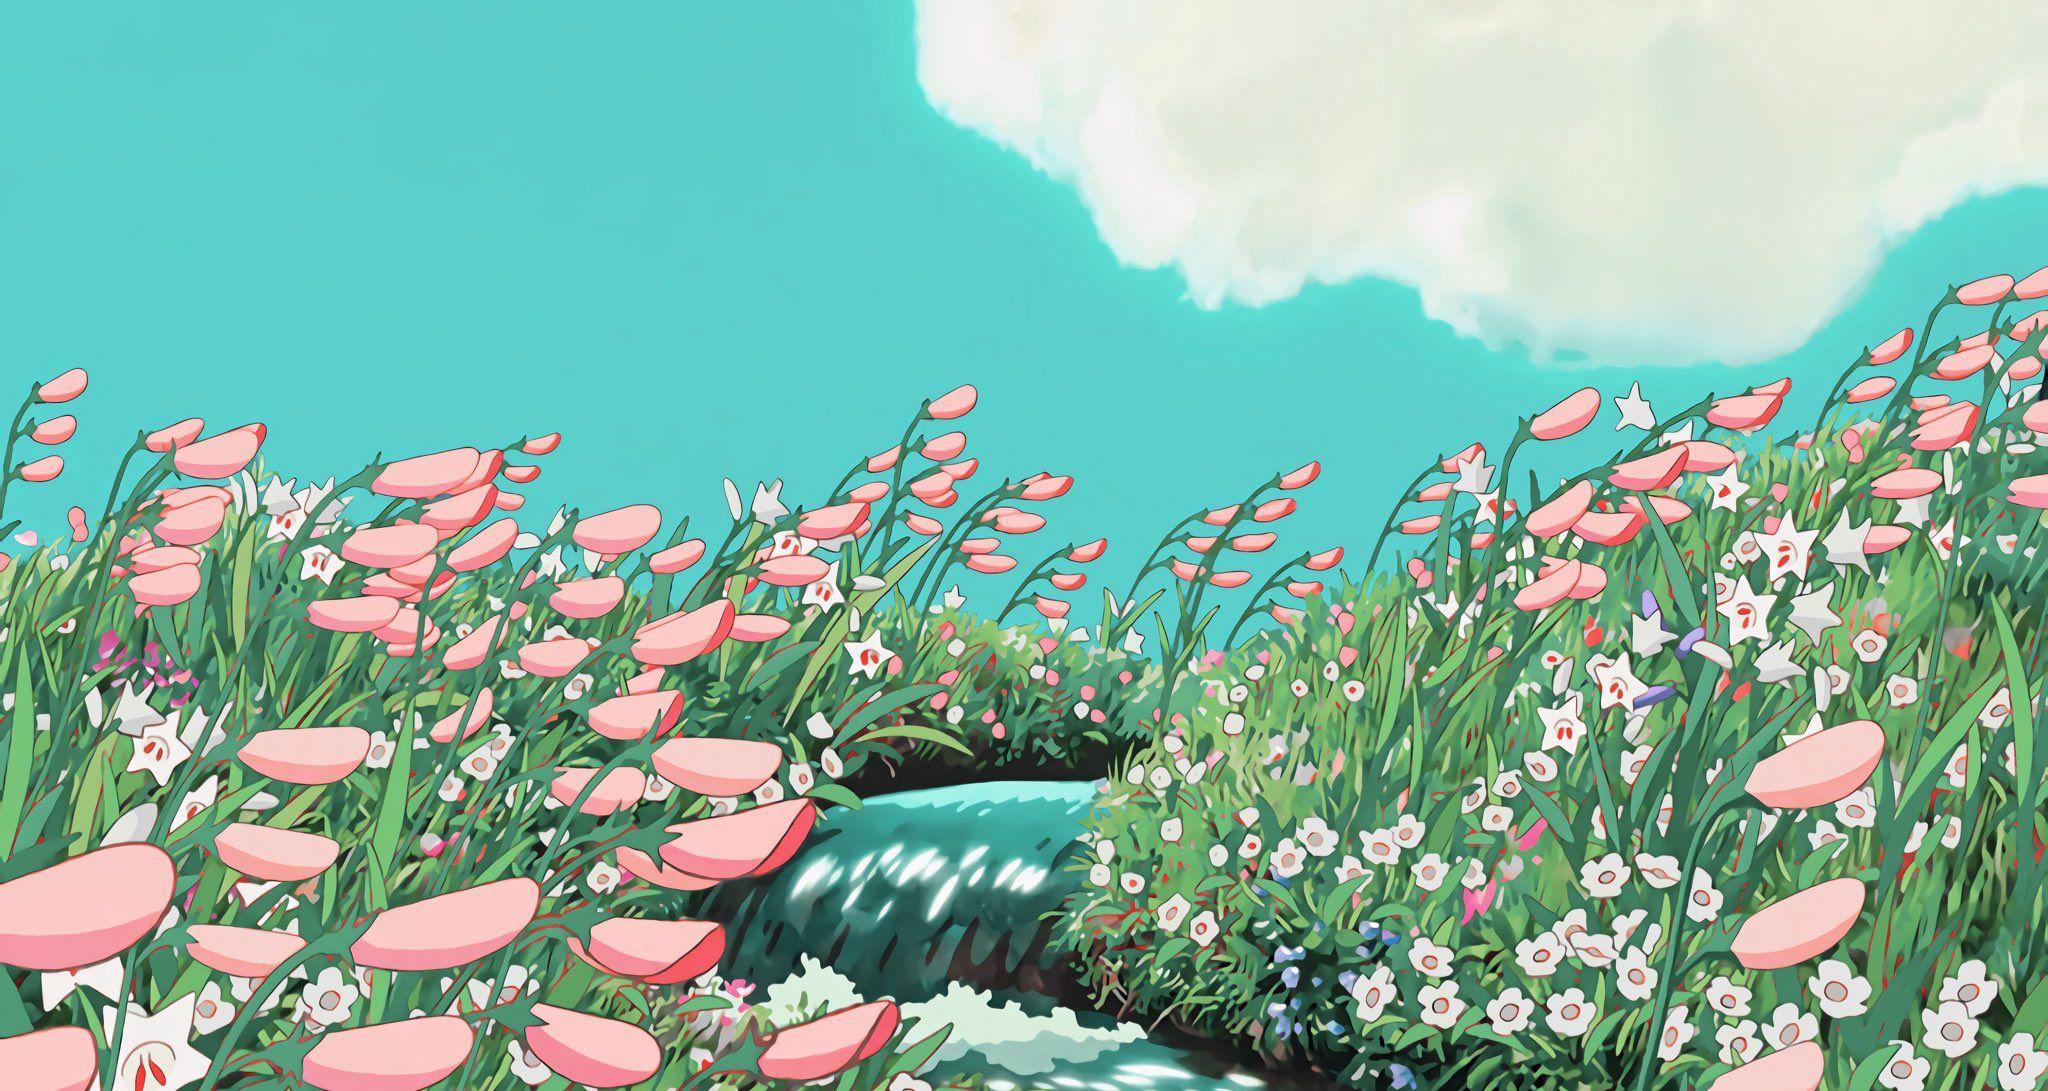 Pin By Ren On Anime Serotonin In 2020 Ghibli Artwork Anime Scenery Wallpaper Anime Scenery